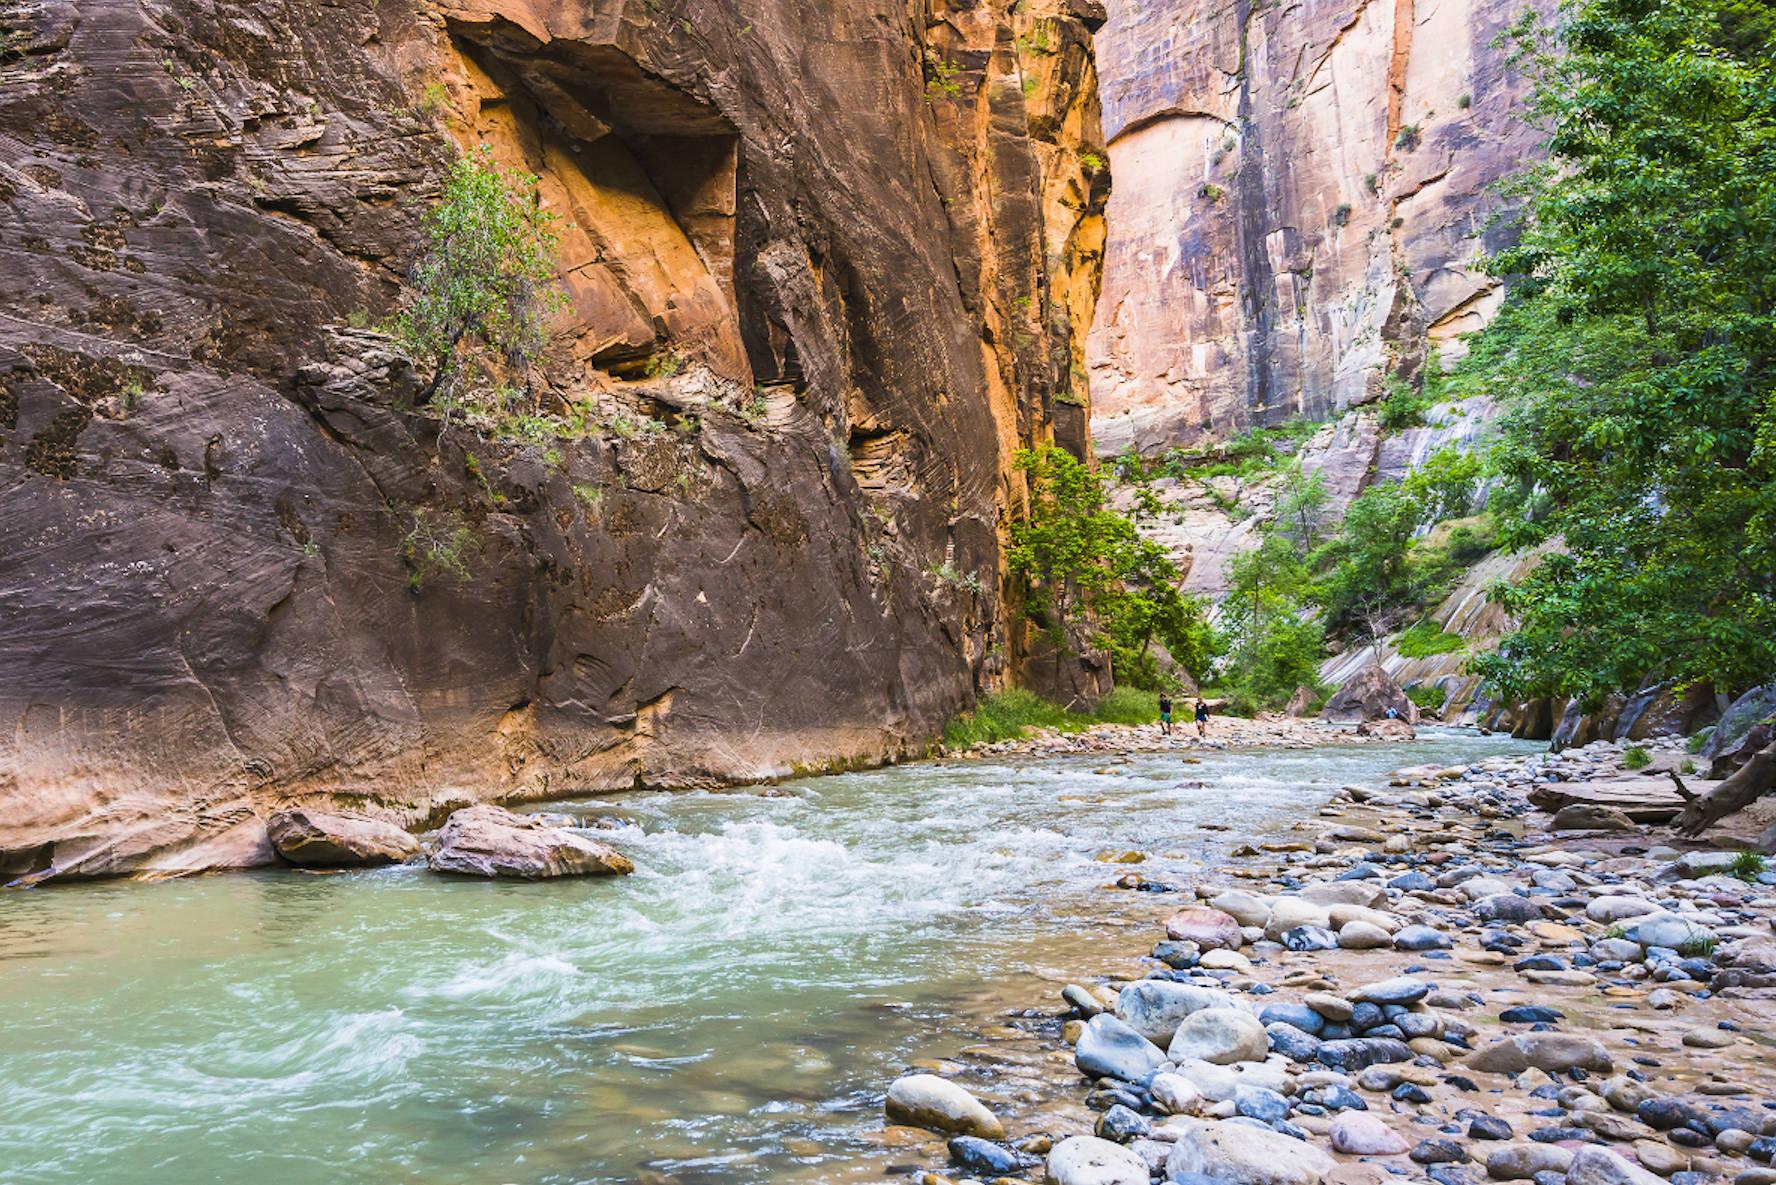 Gap Year Program - ARCC Gap   Southwest: Utah, Colorado, New Mexico, Arizona & California  6